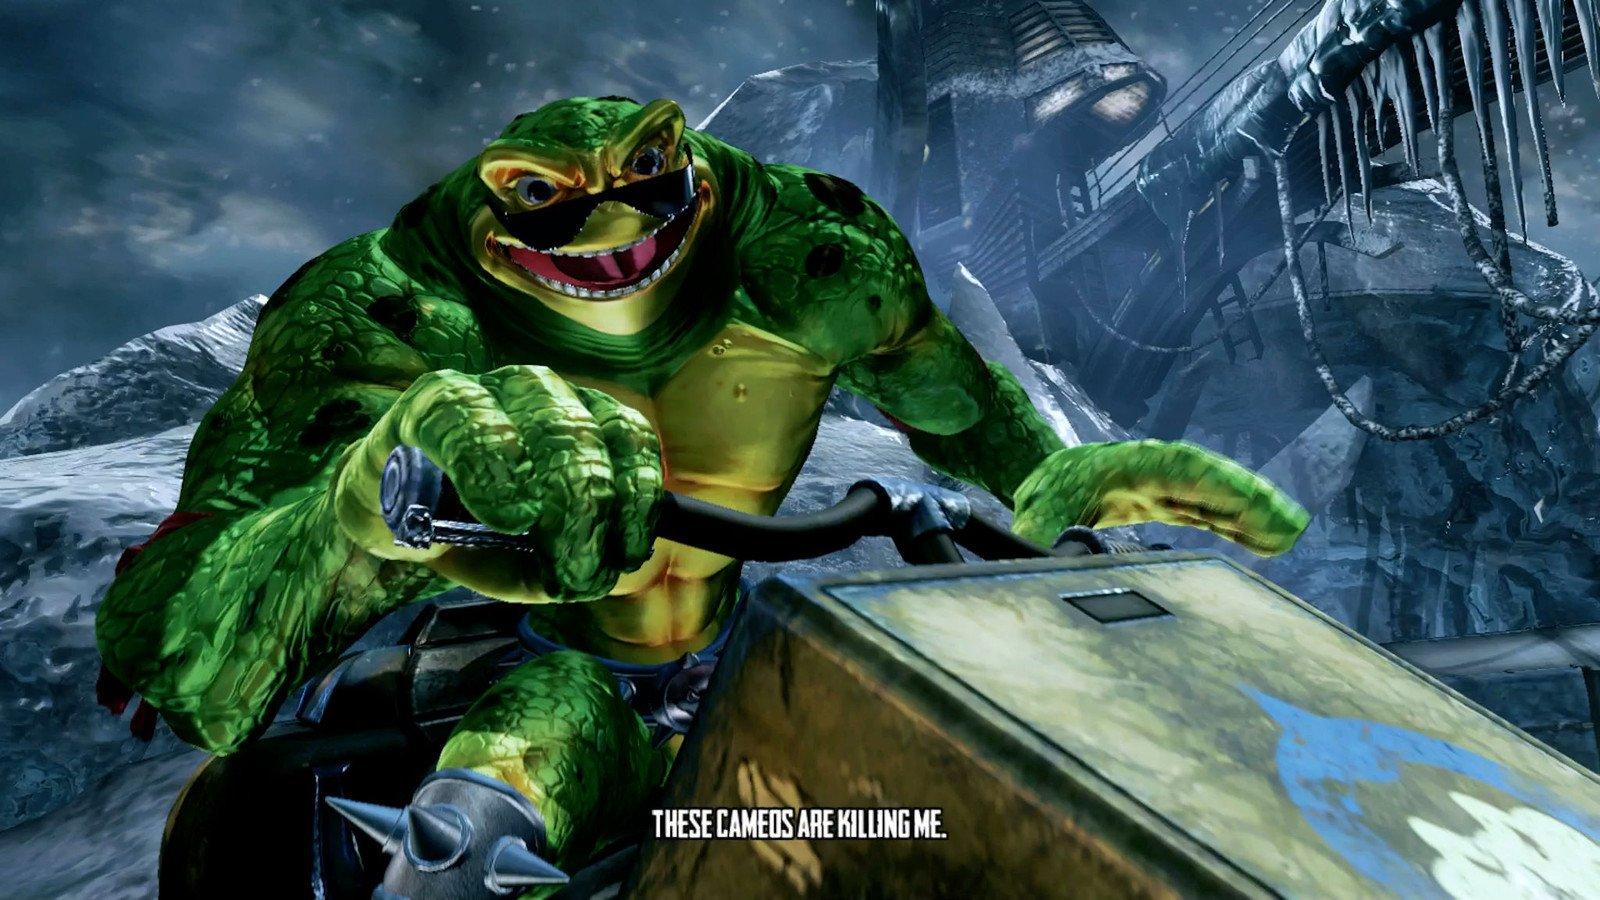 Killer-Instinct-Rash-Battletoads-beta-Xbox-One-screens-12